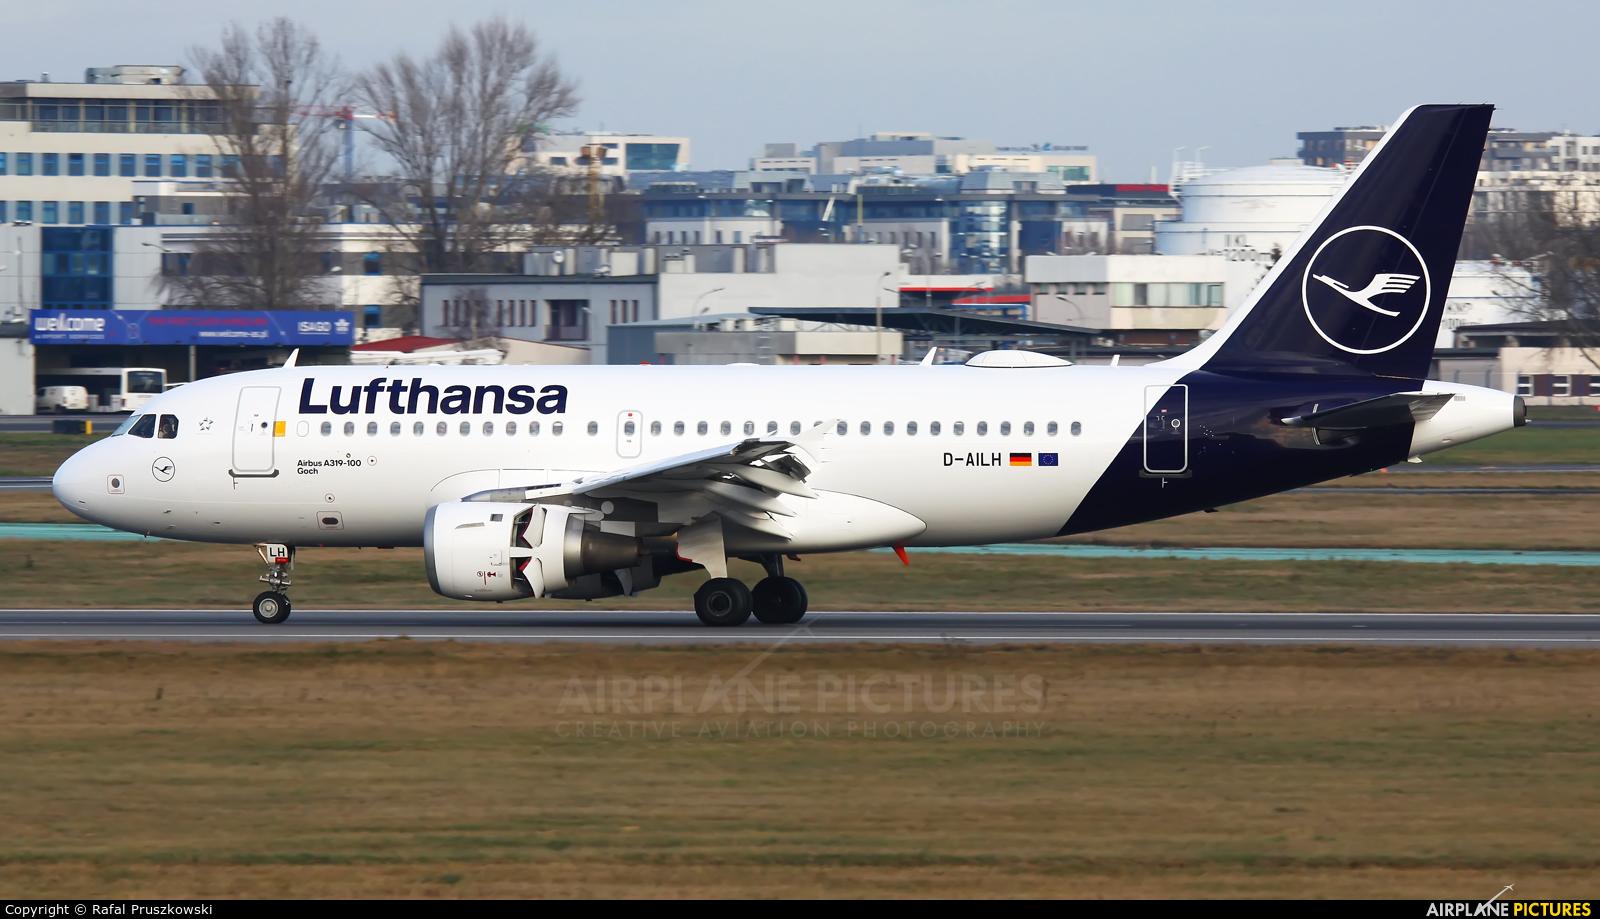 Lufthansa D-AILH aircraft at Warsaw - Frederic Chopin